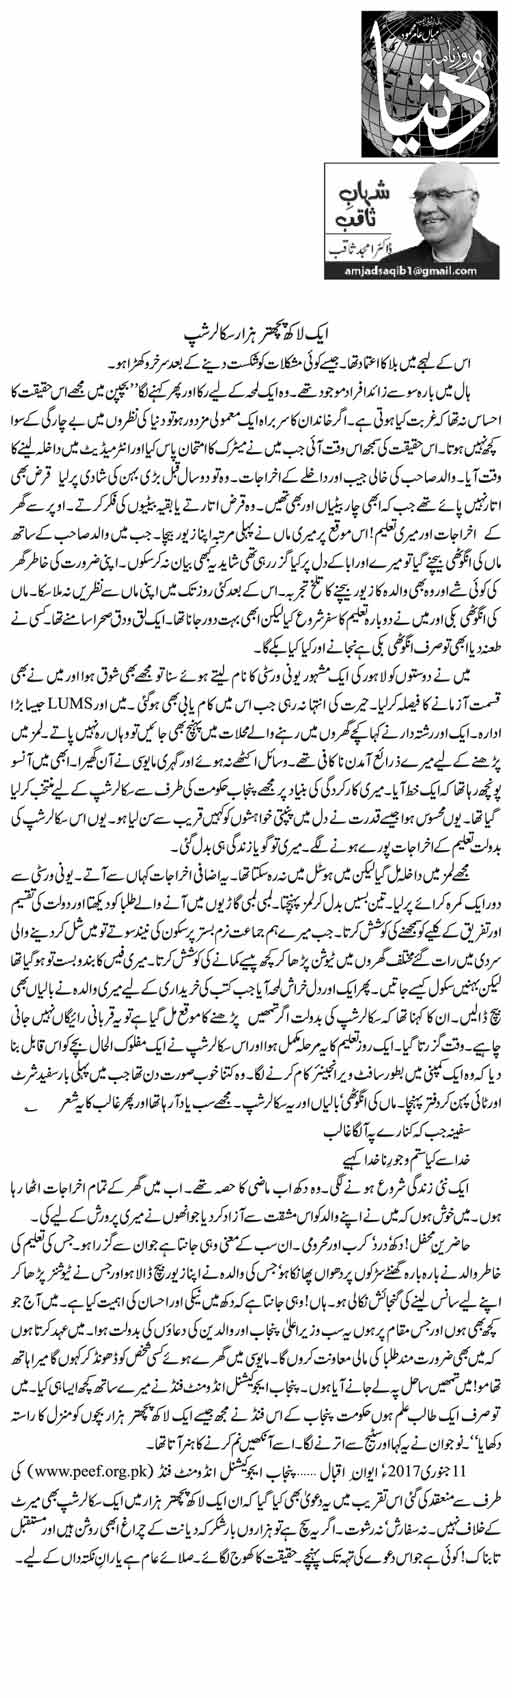 Aik Laakh Pachattar Hazaar Scholarship   Dr. Amjad Saqib   Daily Urdu Columns